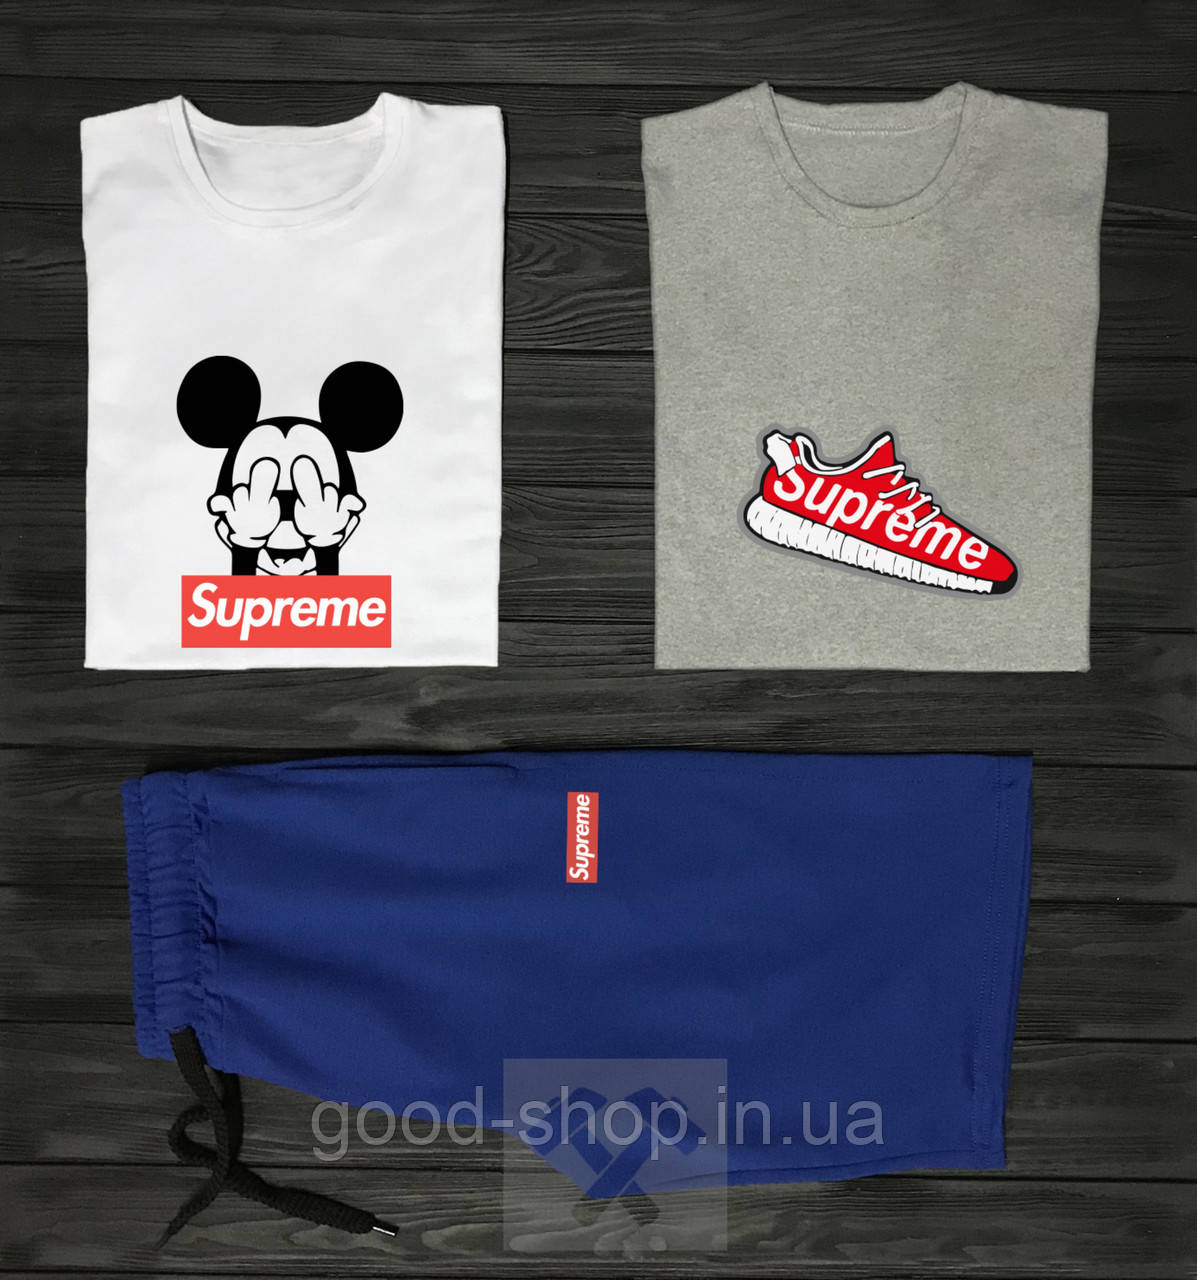 Мужской костюм тройка 2 футболки и шорты Суприм (Supreme), Турецкий трикотаж, копия